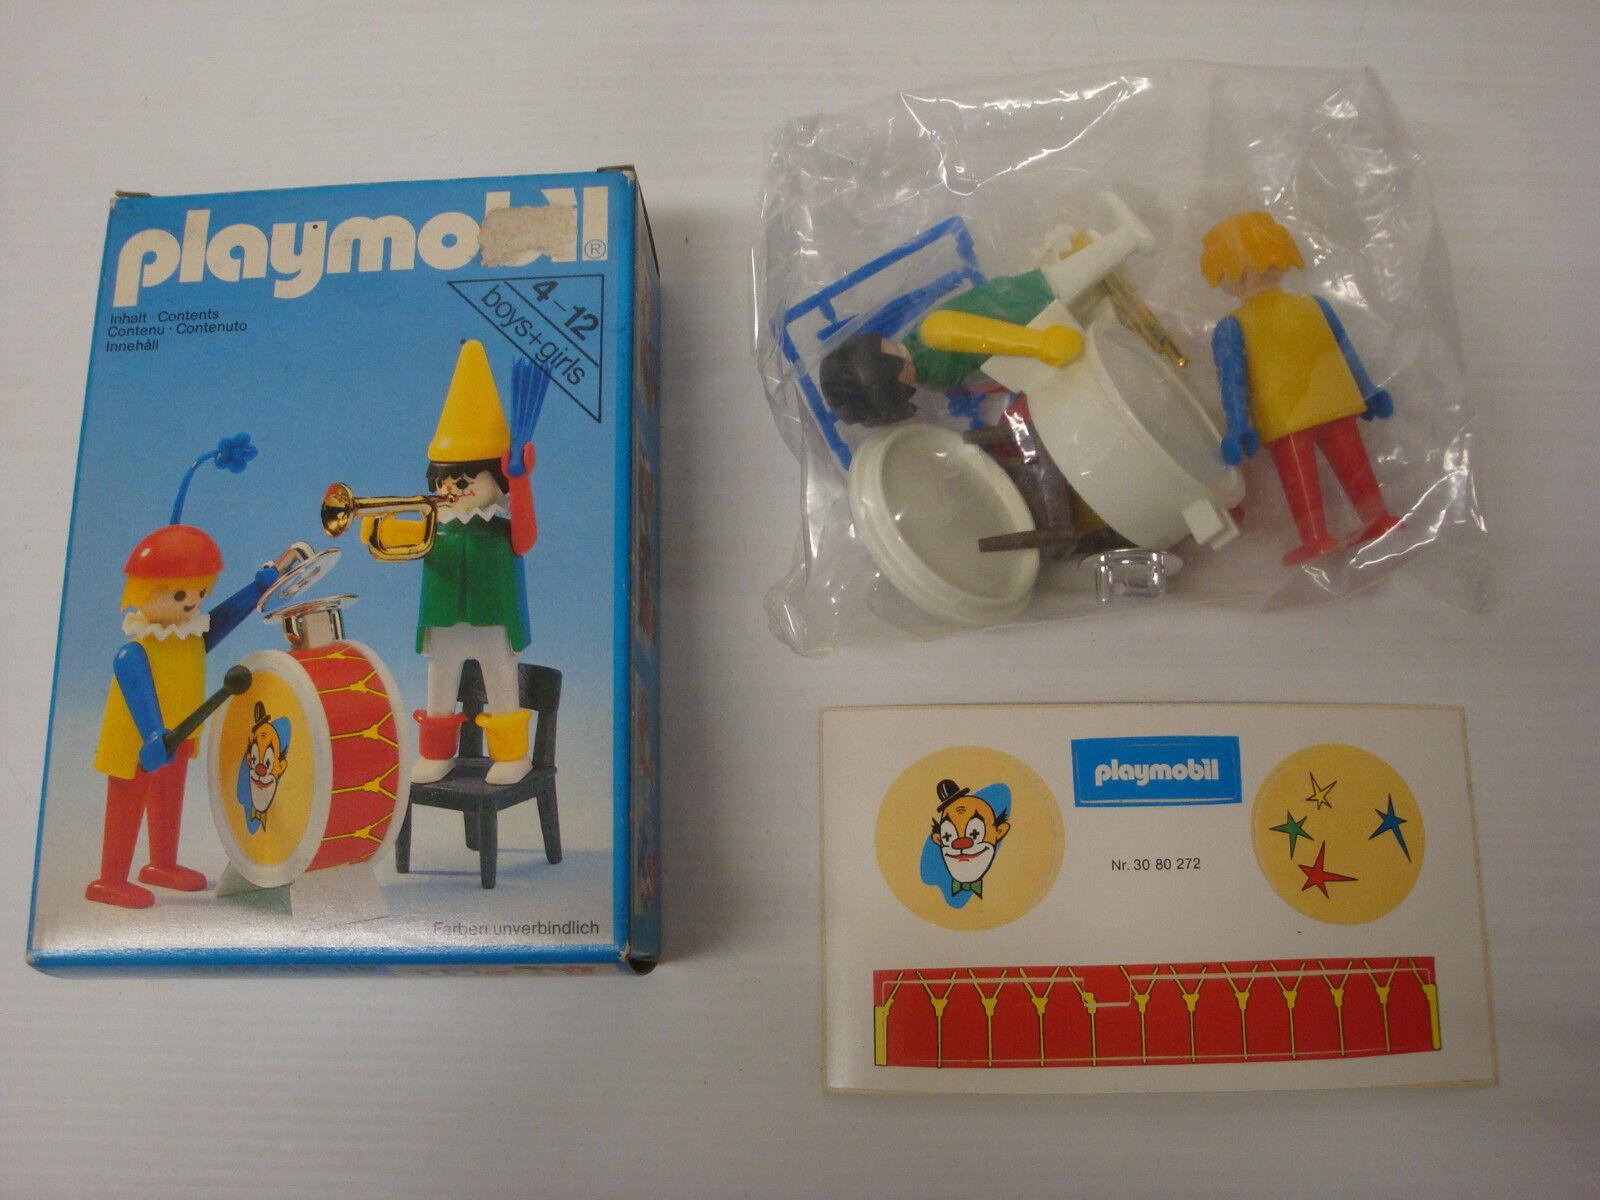 Playmobil Antik Zustand Neu in Originalverpackung Packung Versiegelt - Zirkus 2